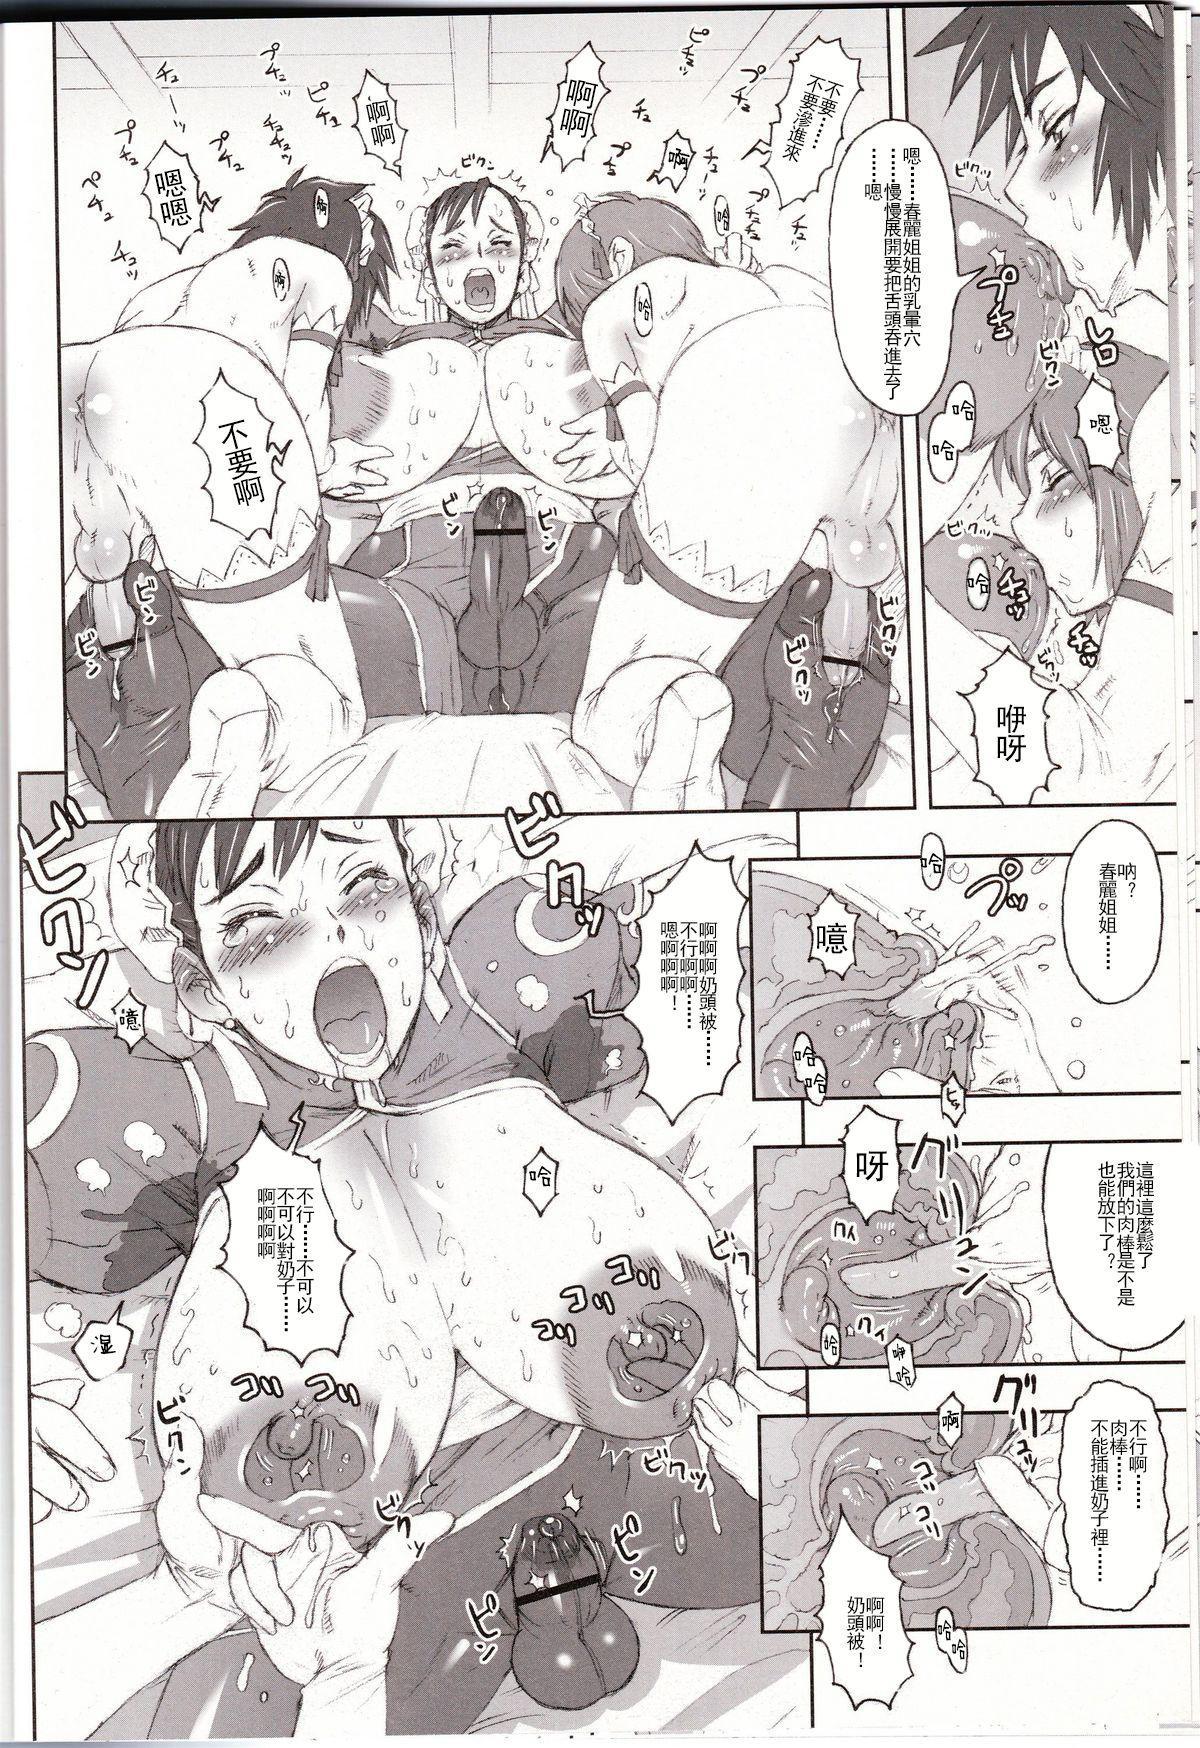 (C70) [Niku Ringo (Kakugari Kyoudai)] NIPPON Onna HEROINE 2 (Darkstalkers, Street Fighter II)[Chinese]【不可视汉化】 14